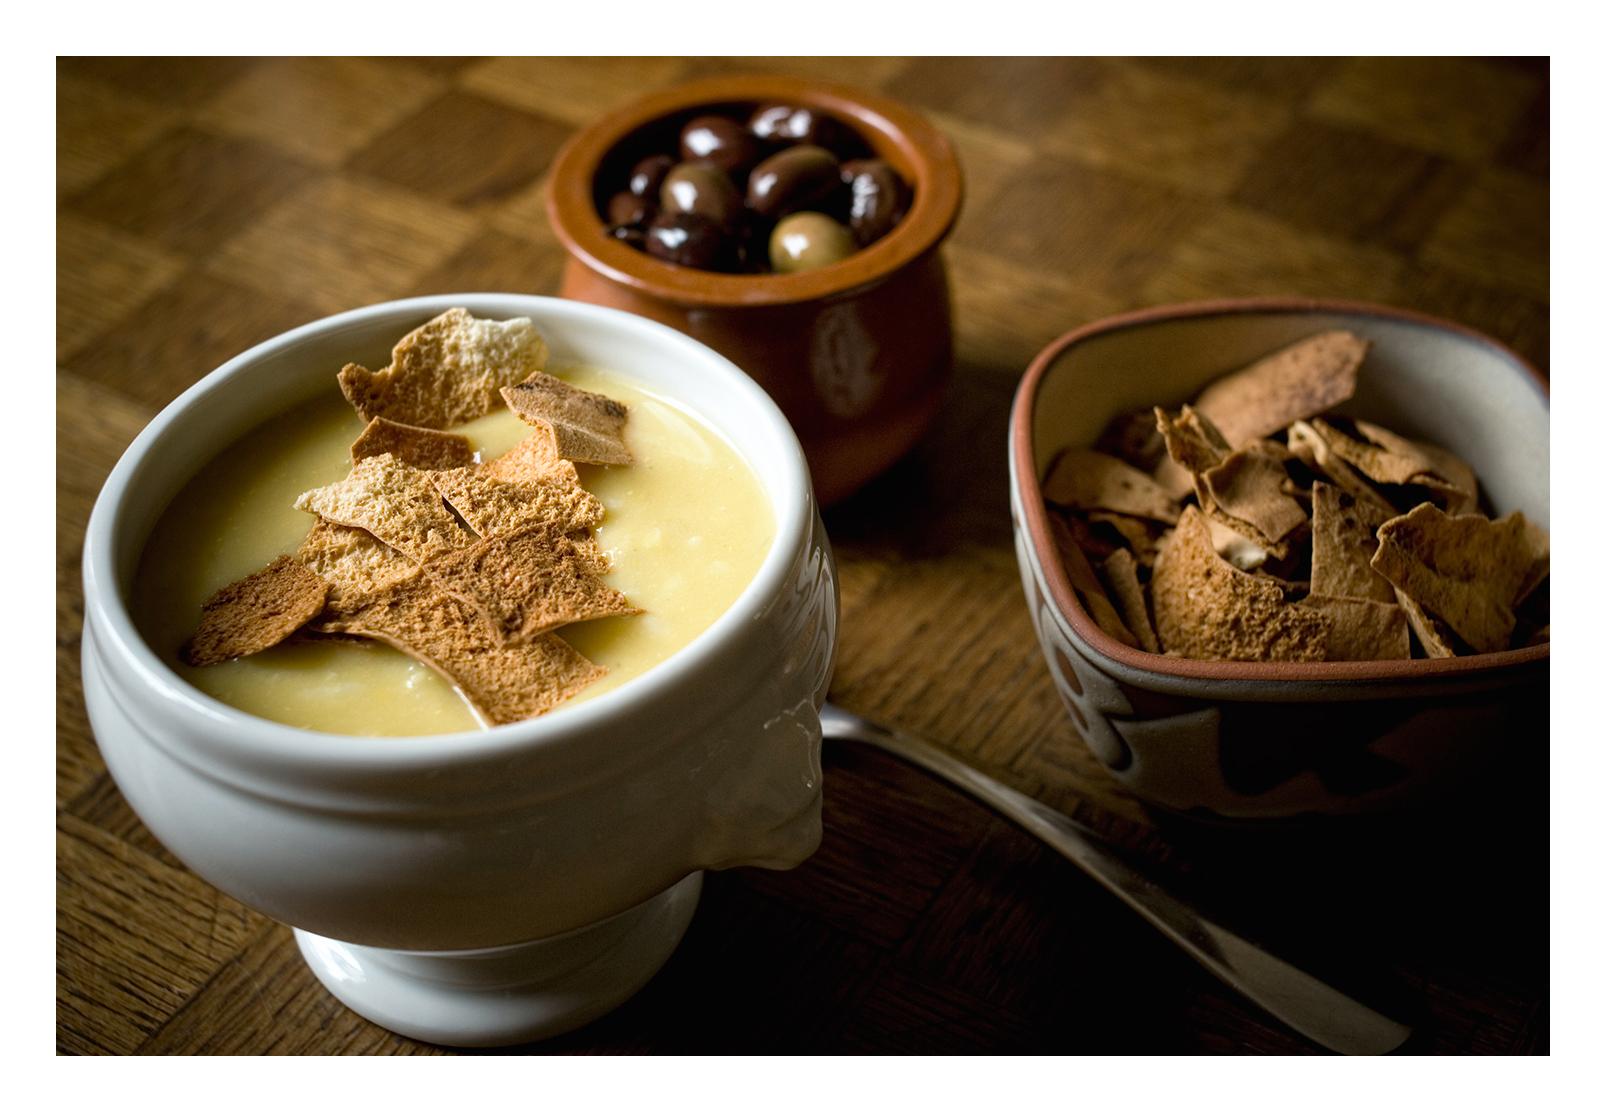 lentil_soup_1836.jpg